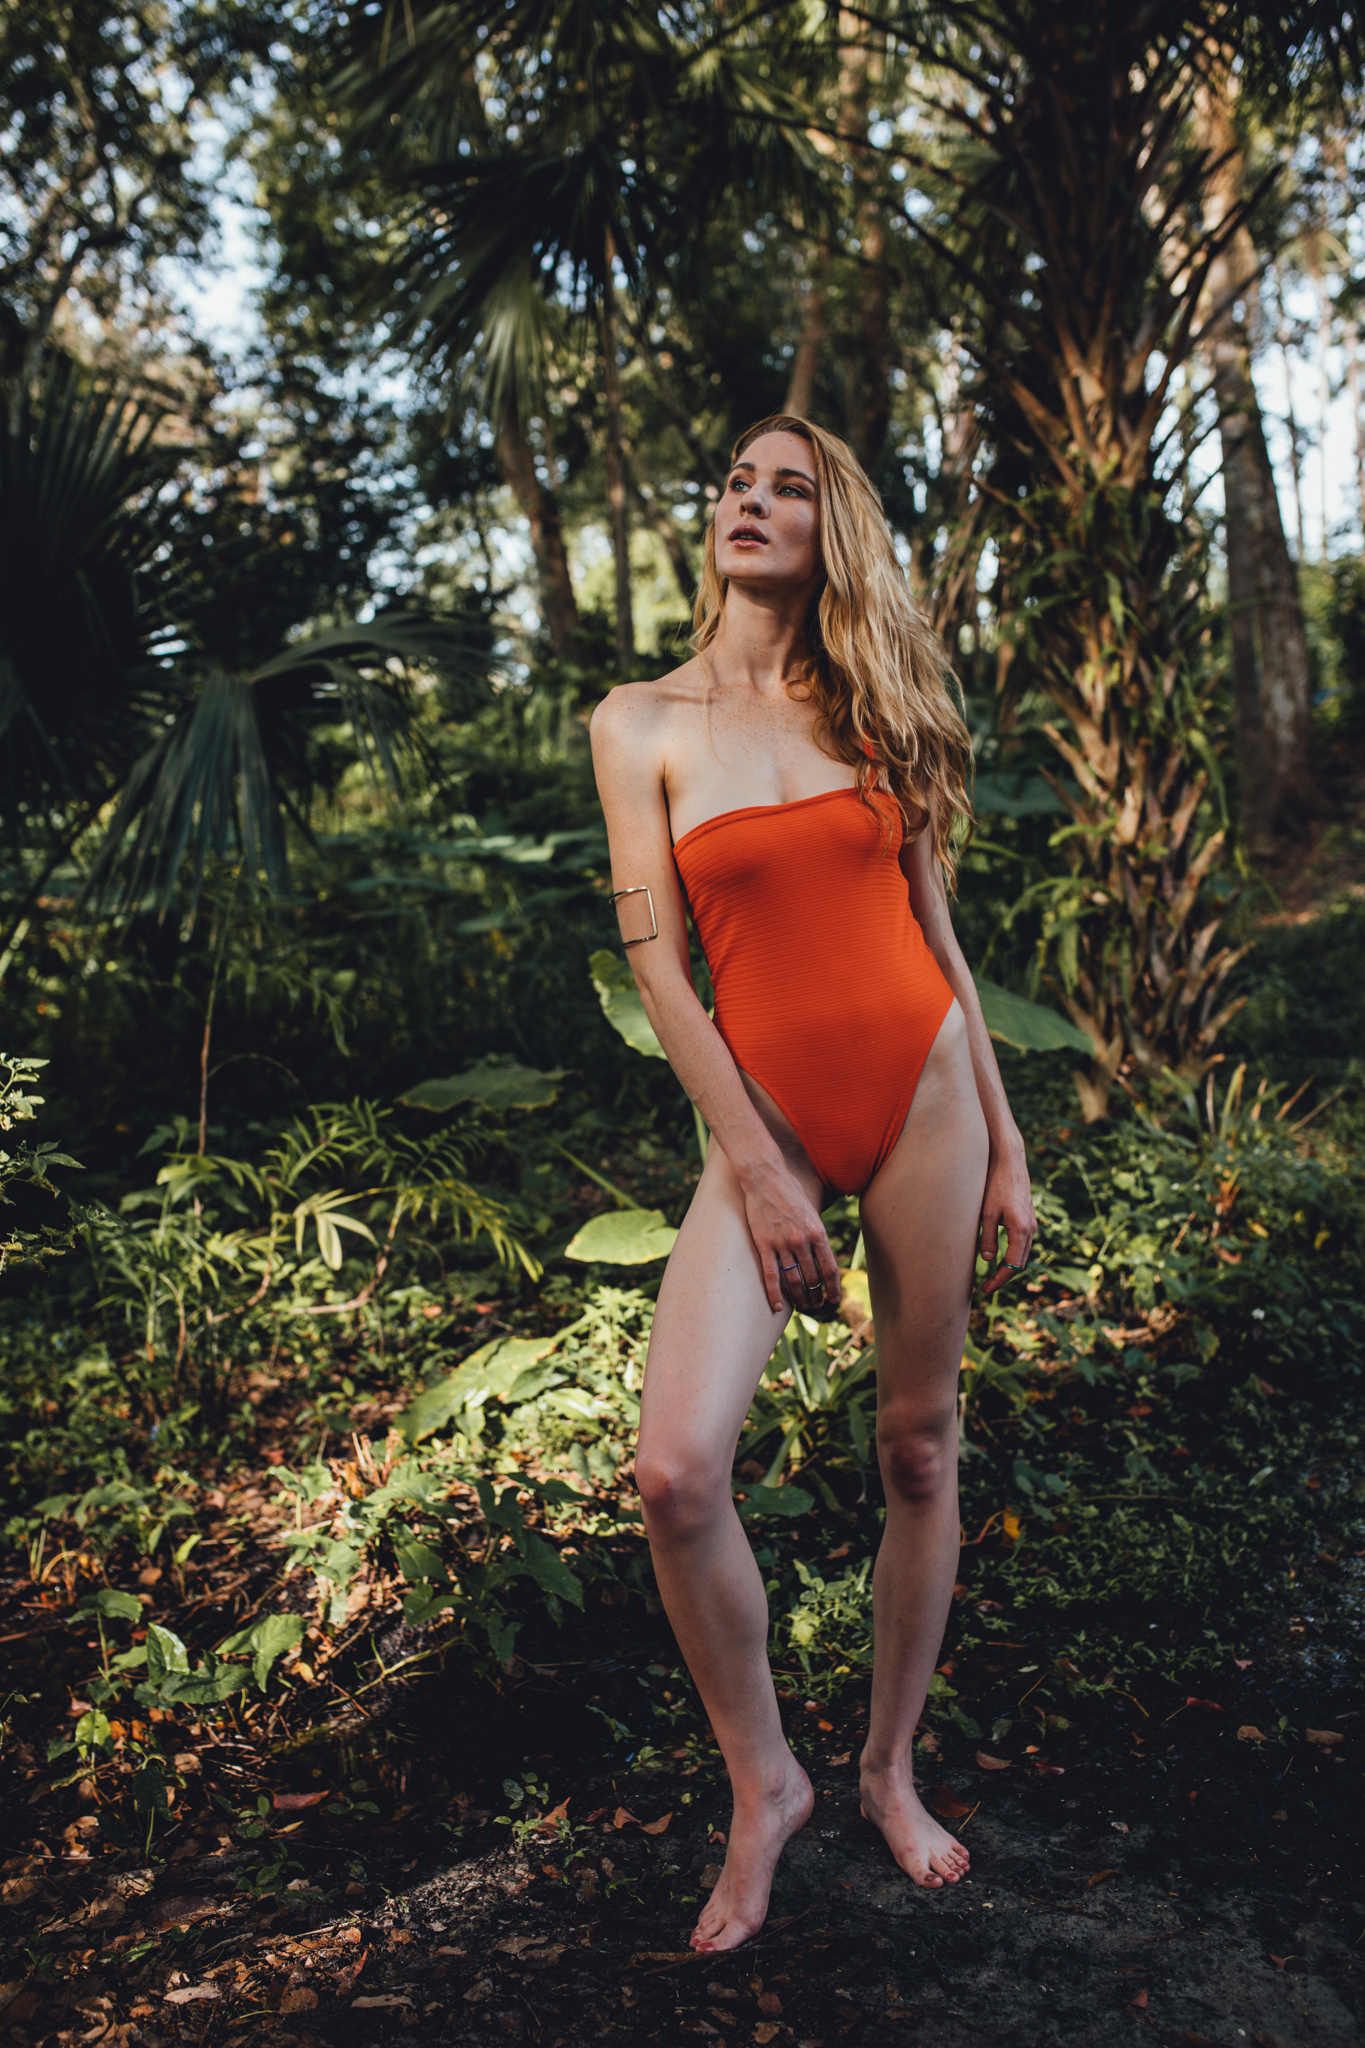 portrait-swimswuit-lifestyle-orlando-photographer-kal visuals